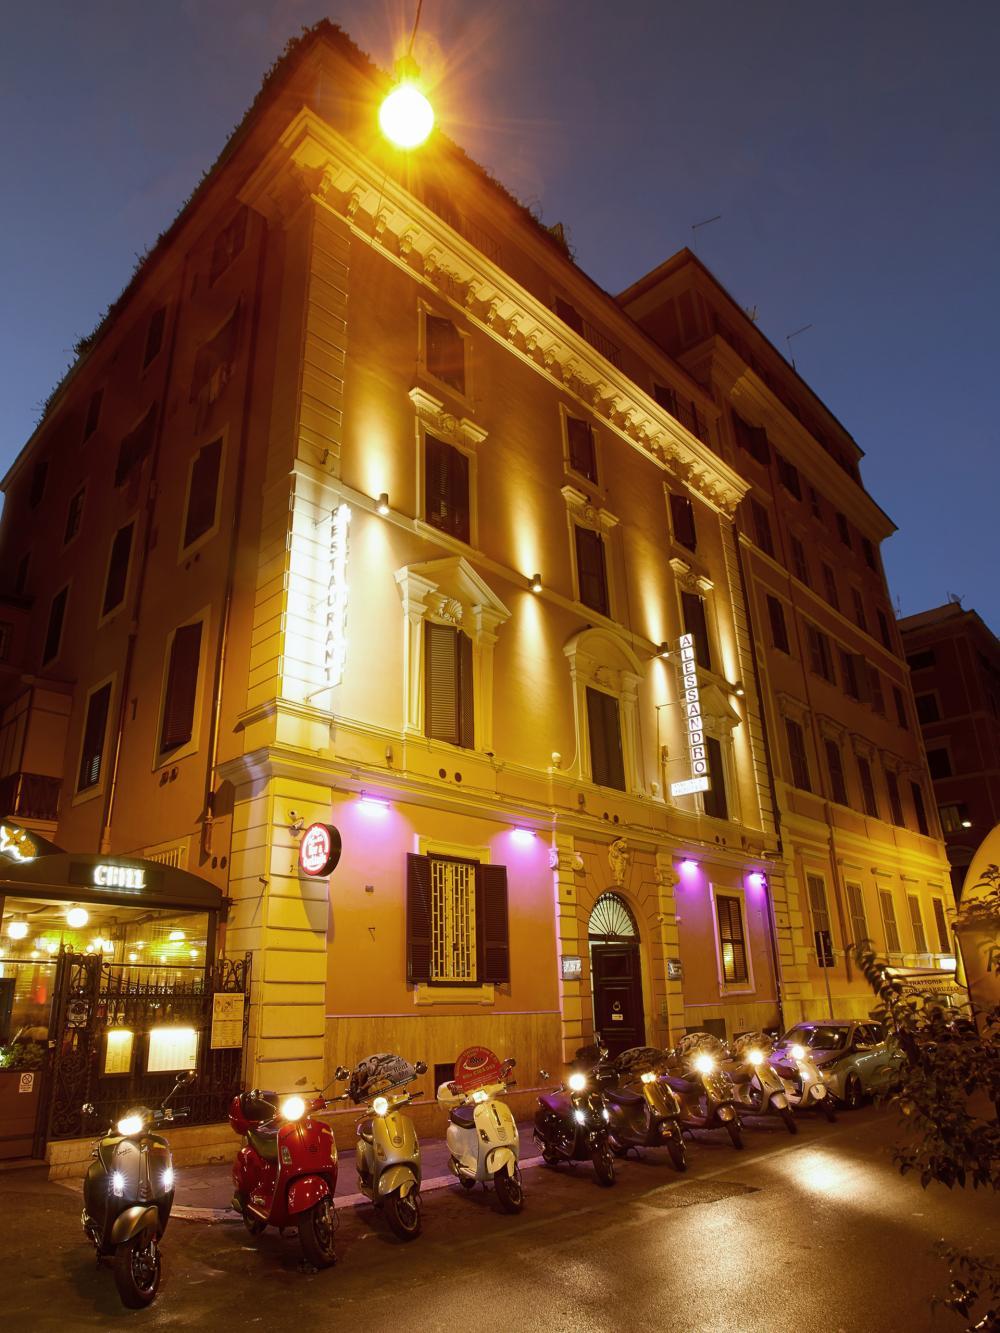 Foto außerhalb Alessandro Palace & Bar